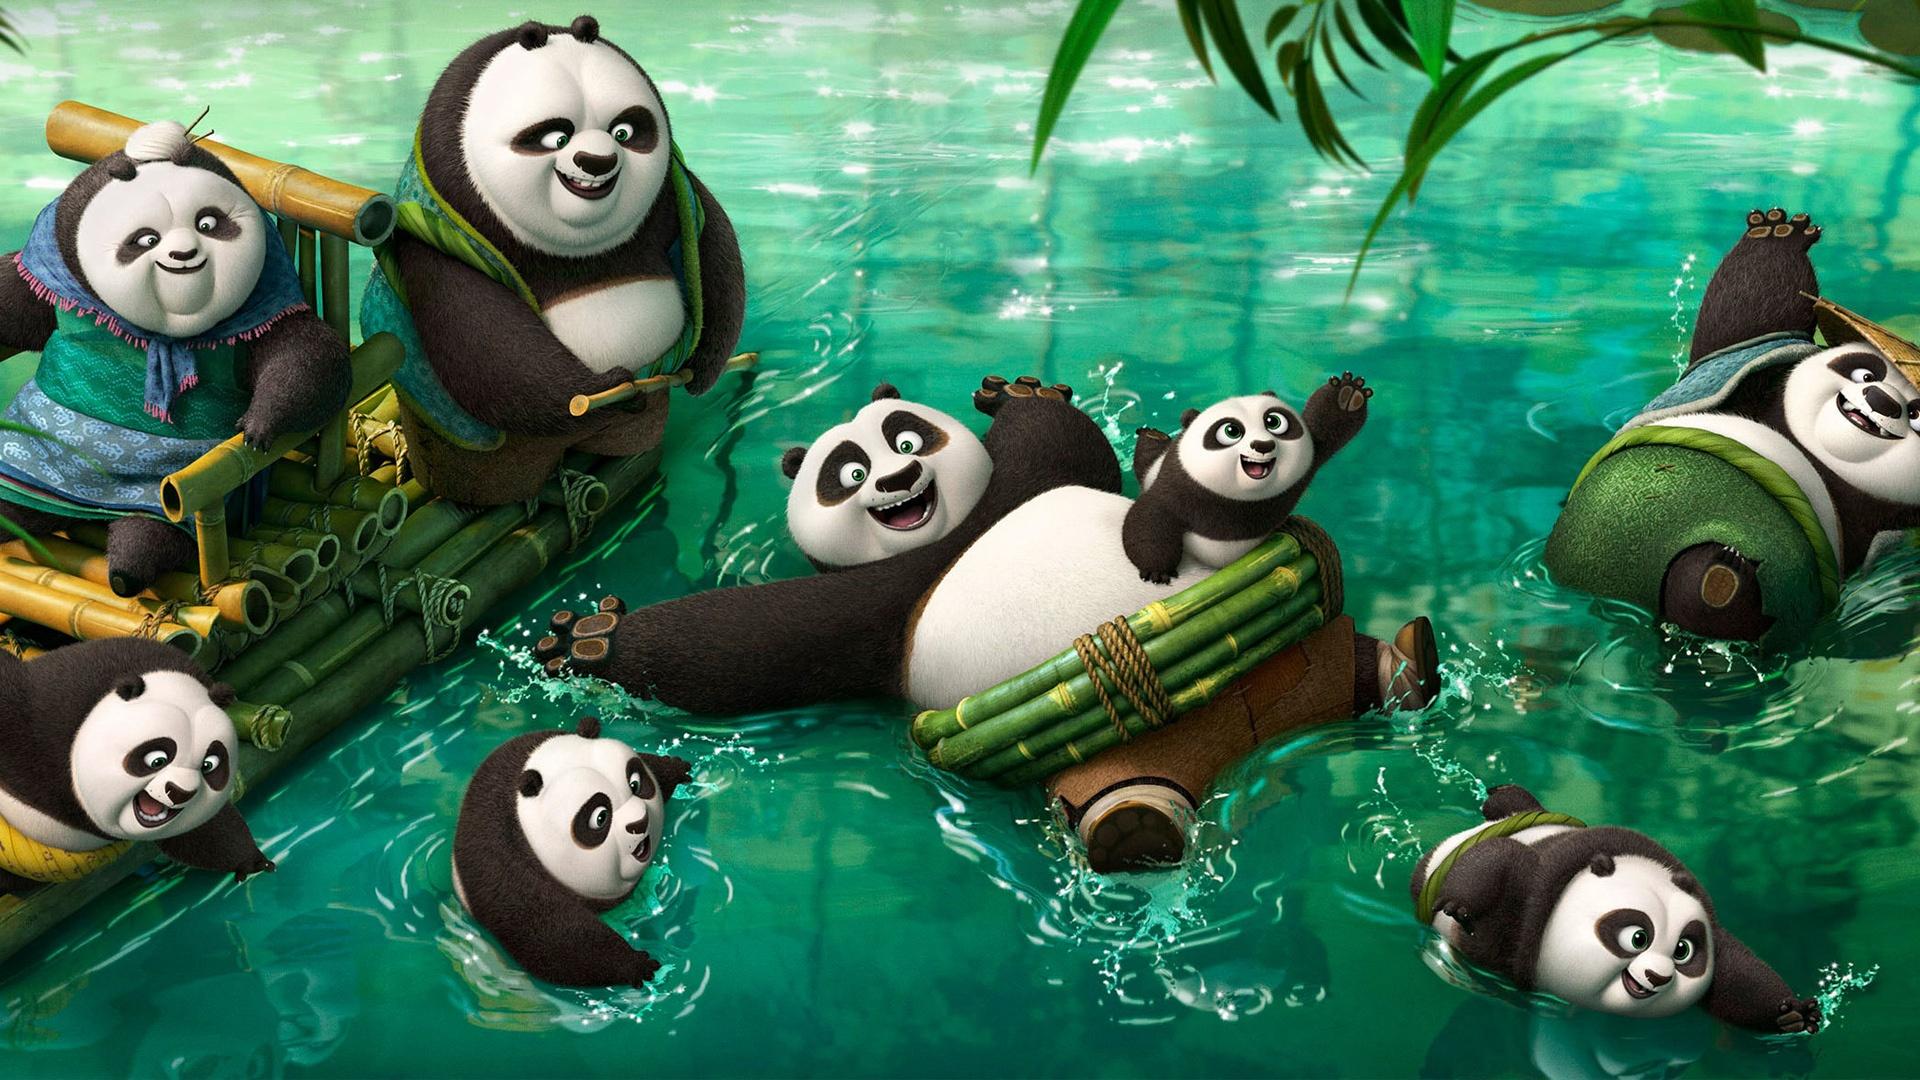 Kung fu panda 3 new pandas wallpapers in jpg format for - Kung fu panda wallpaper ...